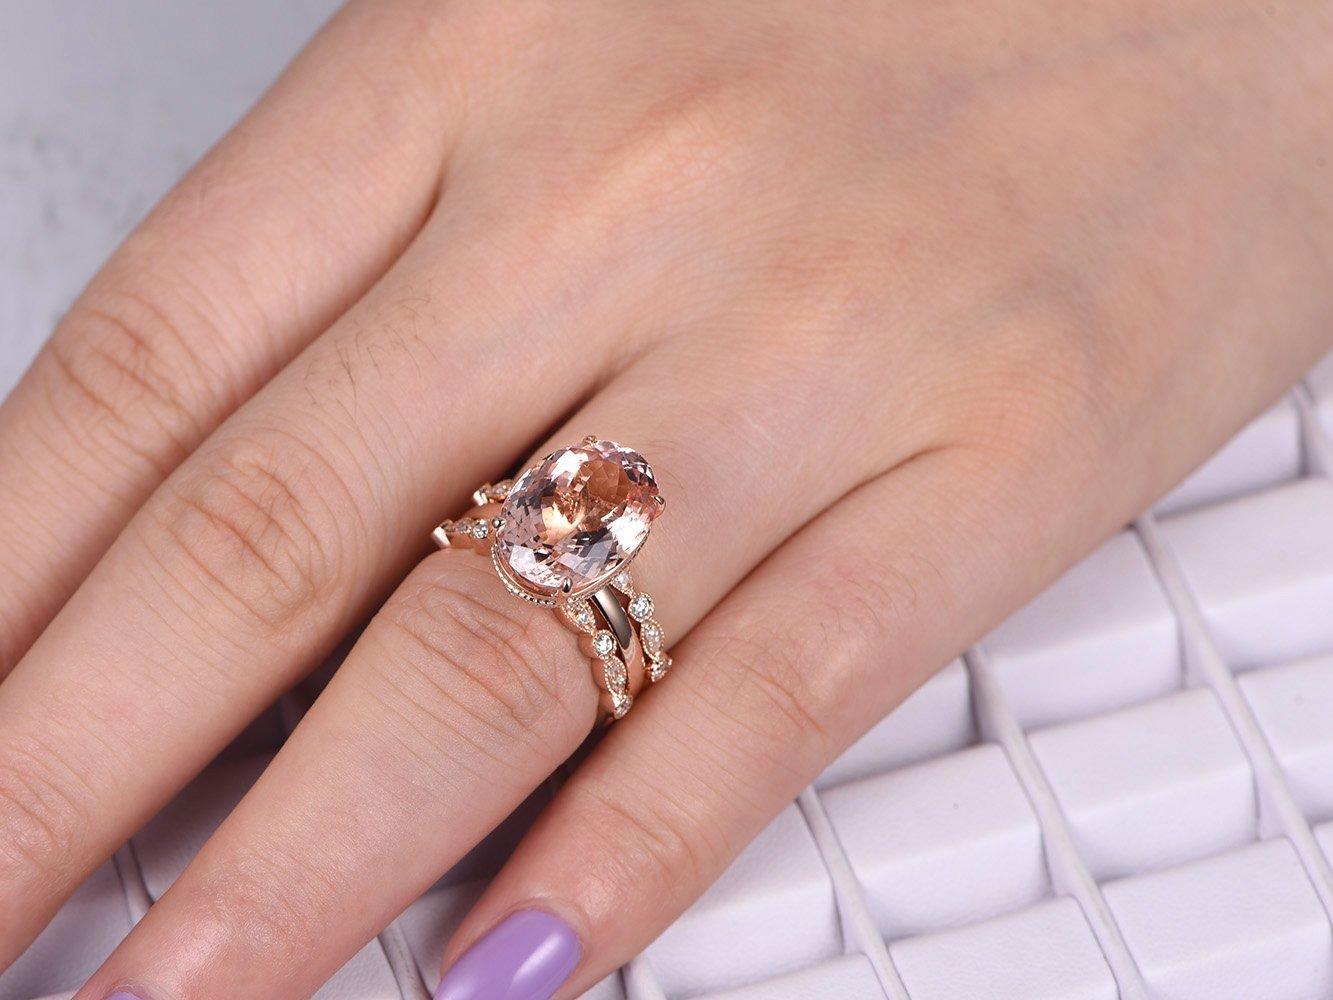 Oval Morganite Engagement Ring Set Pave Diamond Wedding 14K Rose Gold 10x14mm